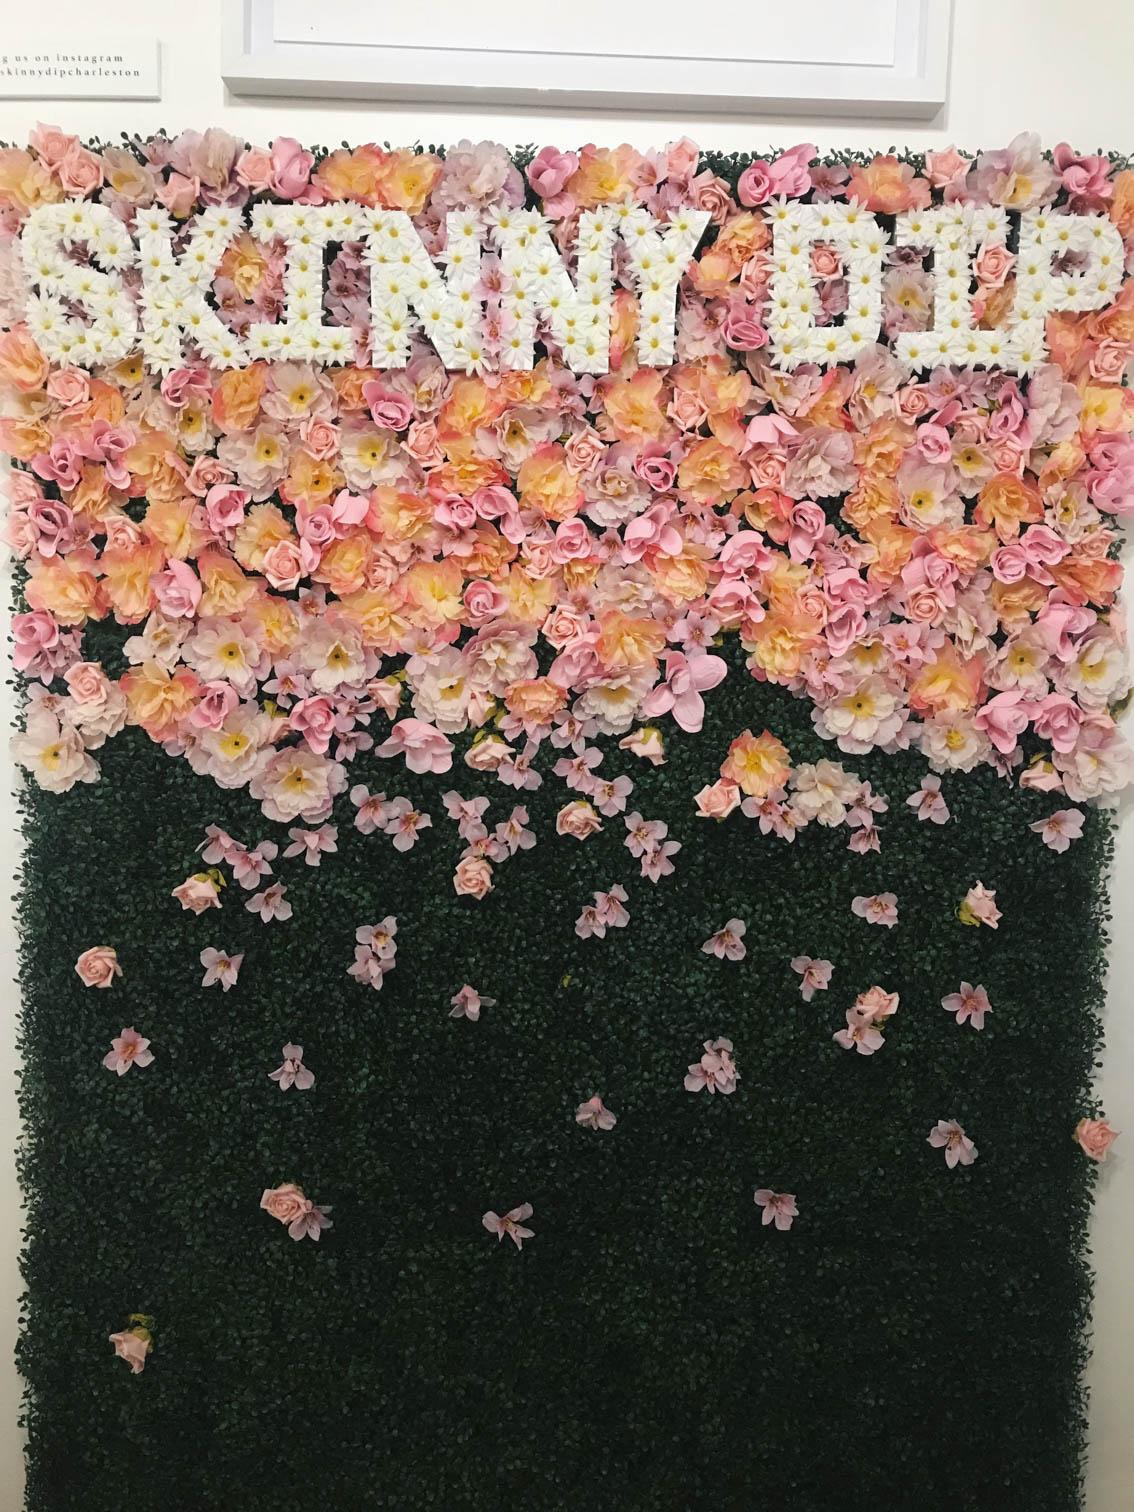 Skinny Dip Flower Wall Charleston, SC